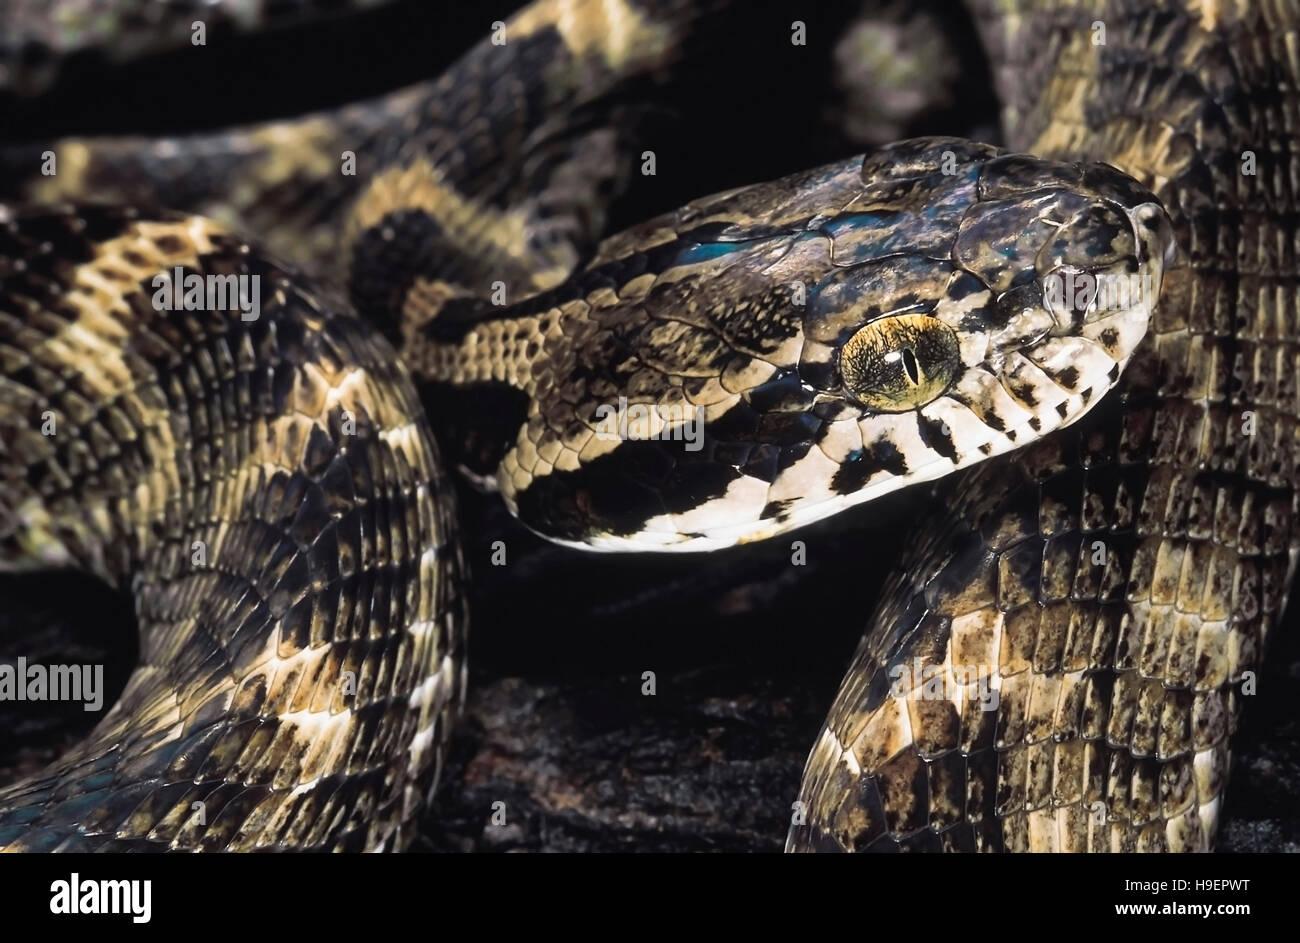 Boiga Forsteni. Le chat de Forsten serpent. Les non venimeux. Le Maharashtra, Inde. Photo Stock